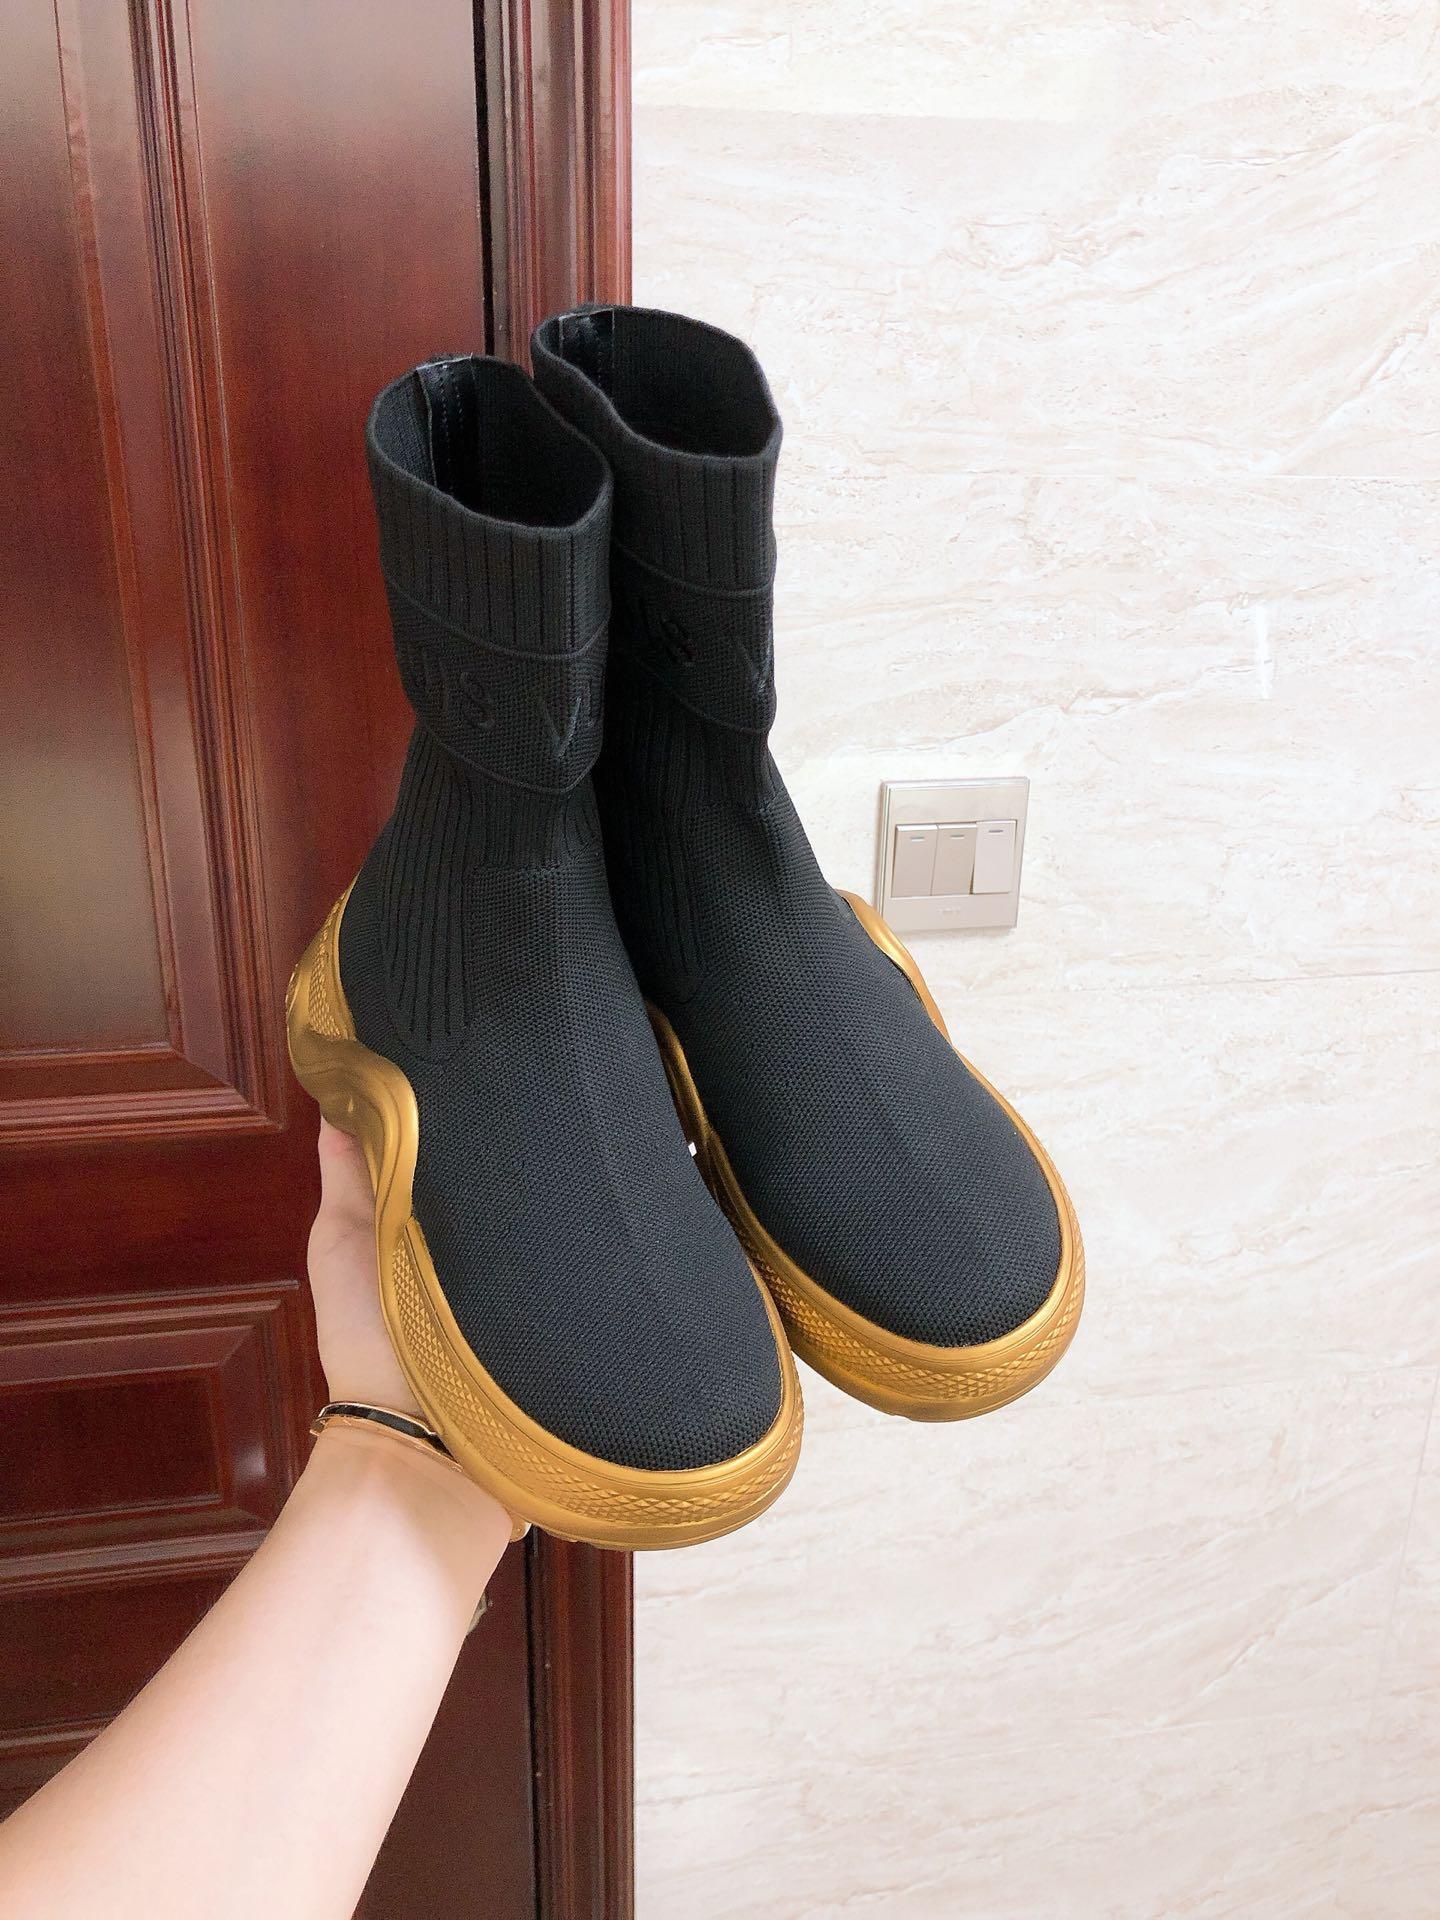 lv archlight sneaker boot 1A52LX lv women boot lv women sneaker lv shoes  9